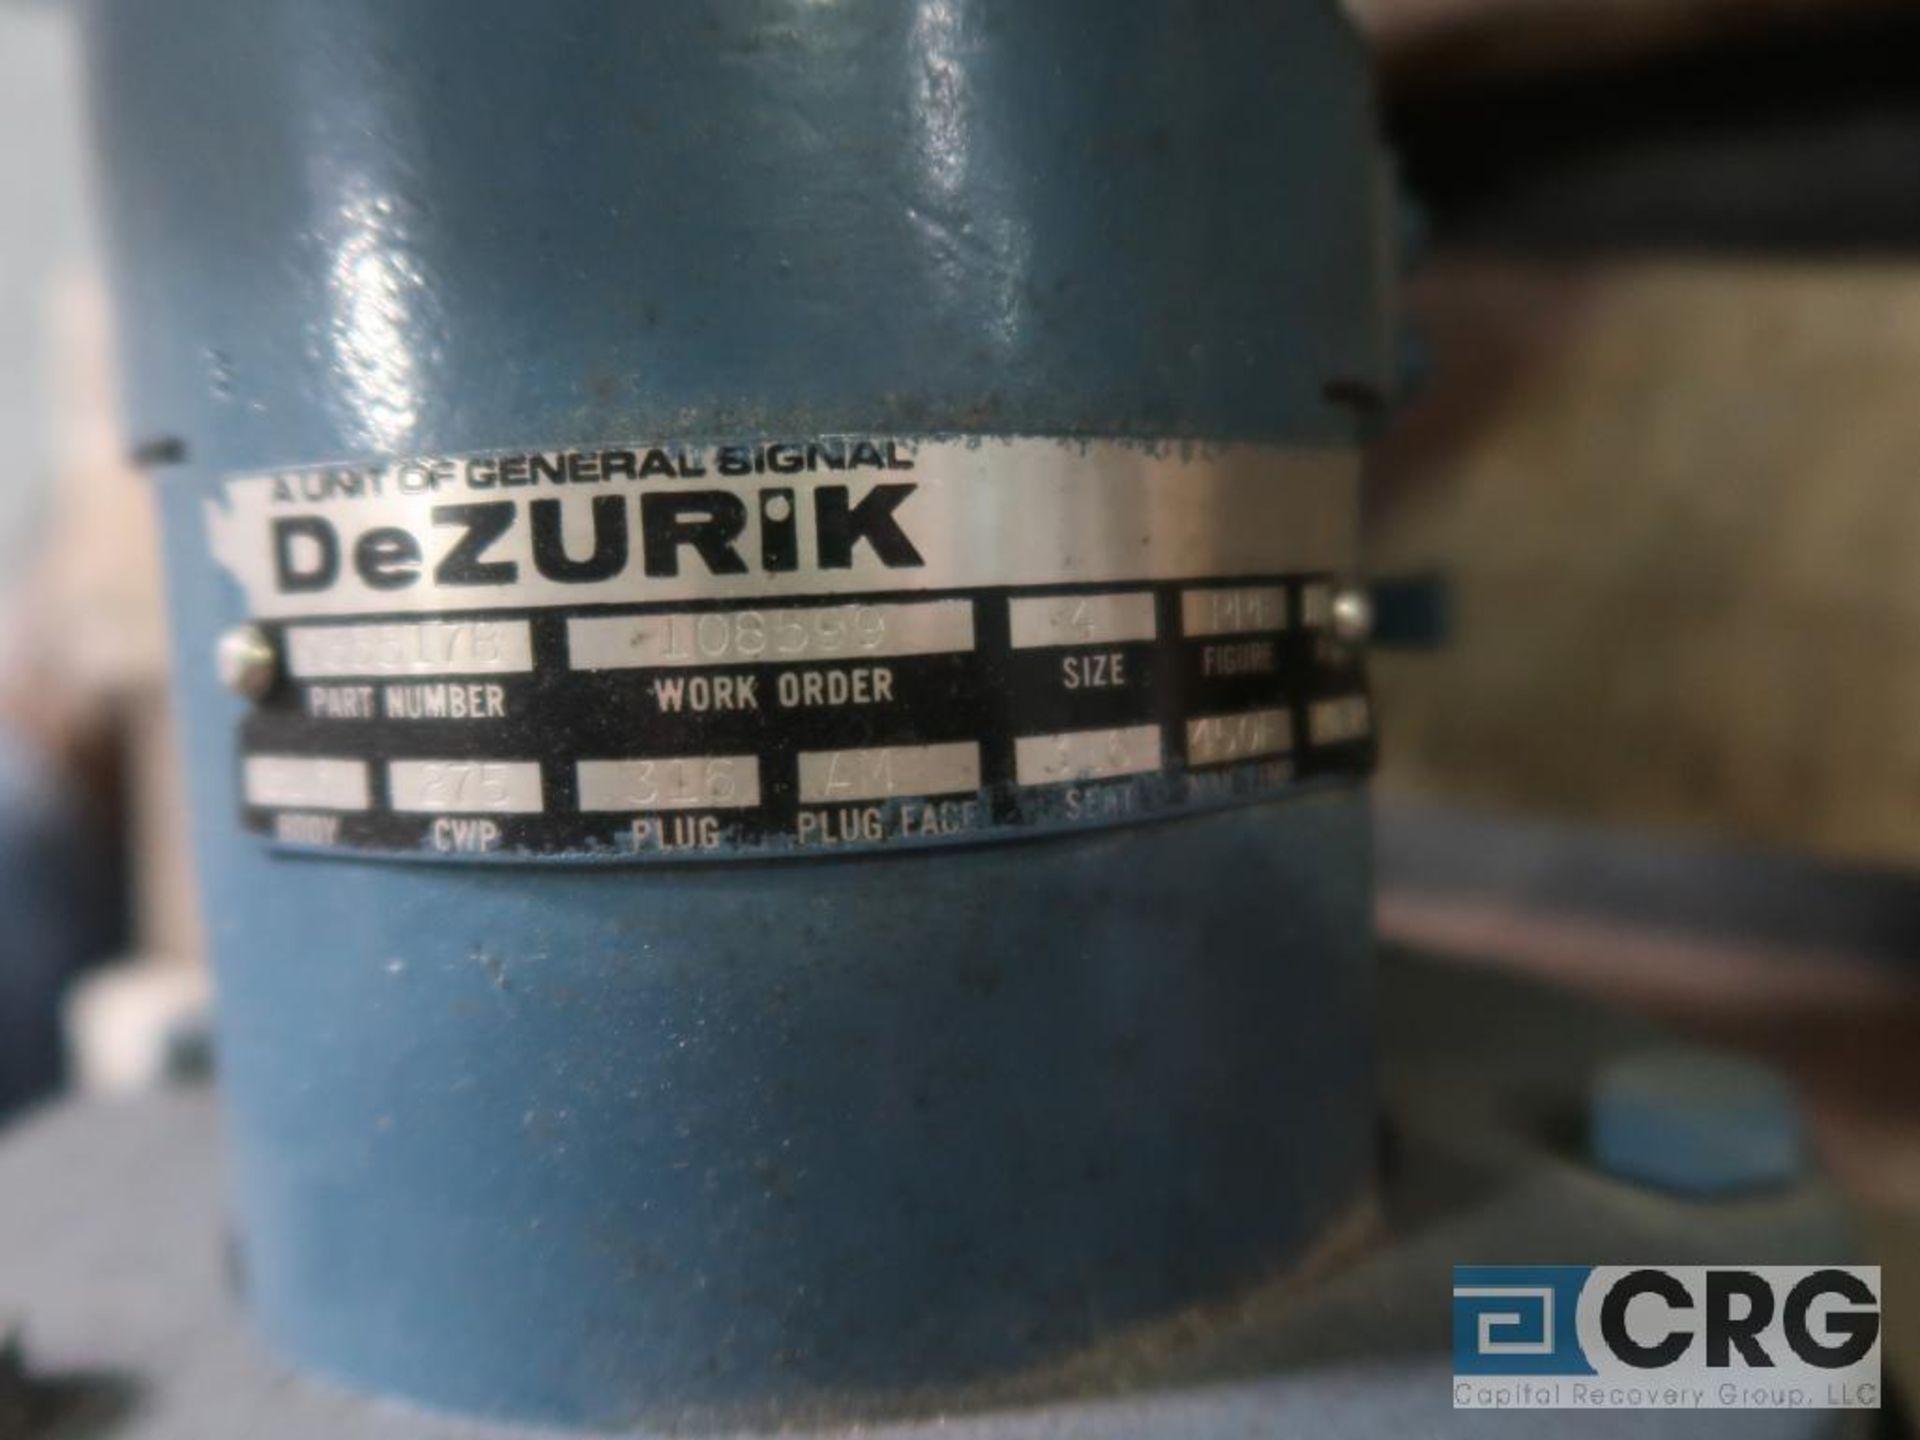 DeZurik stainless 4 in. actuator valve (Finish Building) - Image 2 of 2